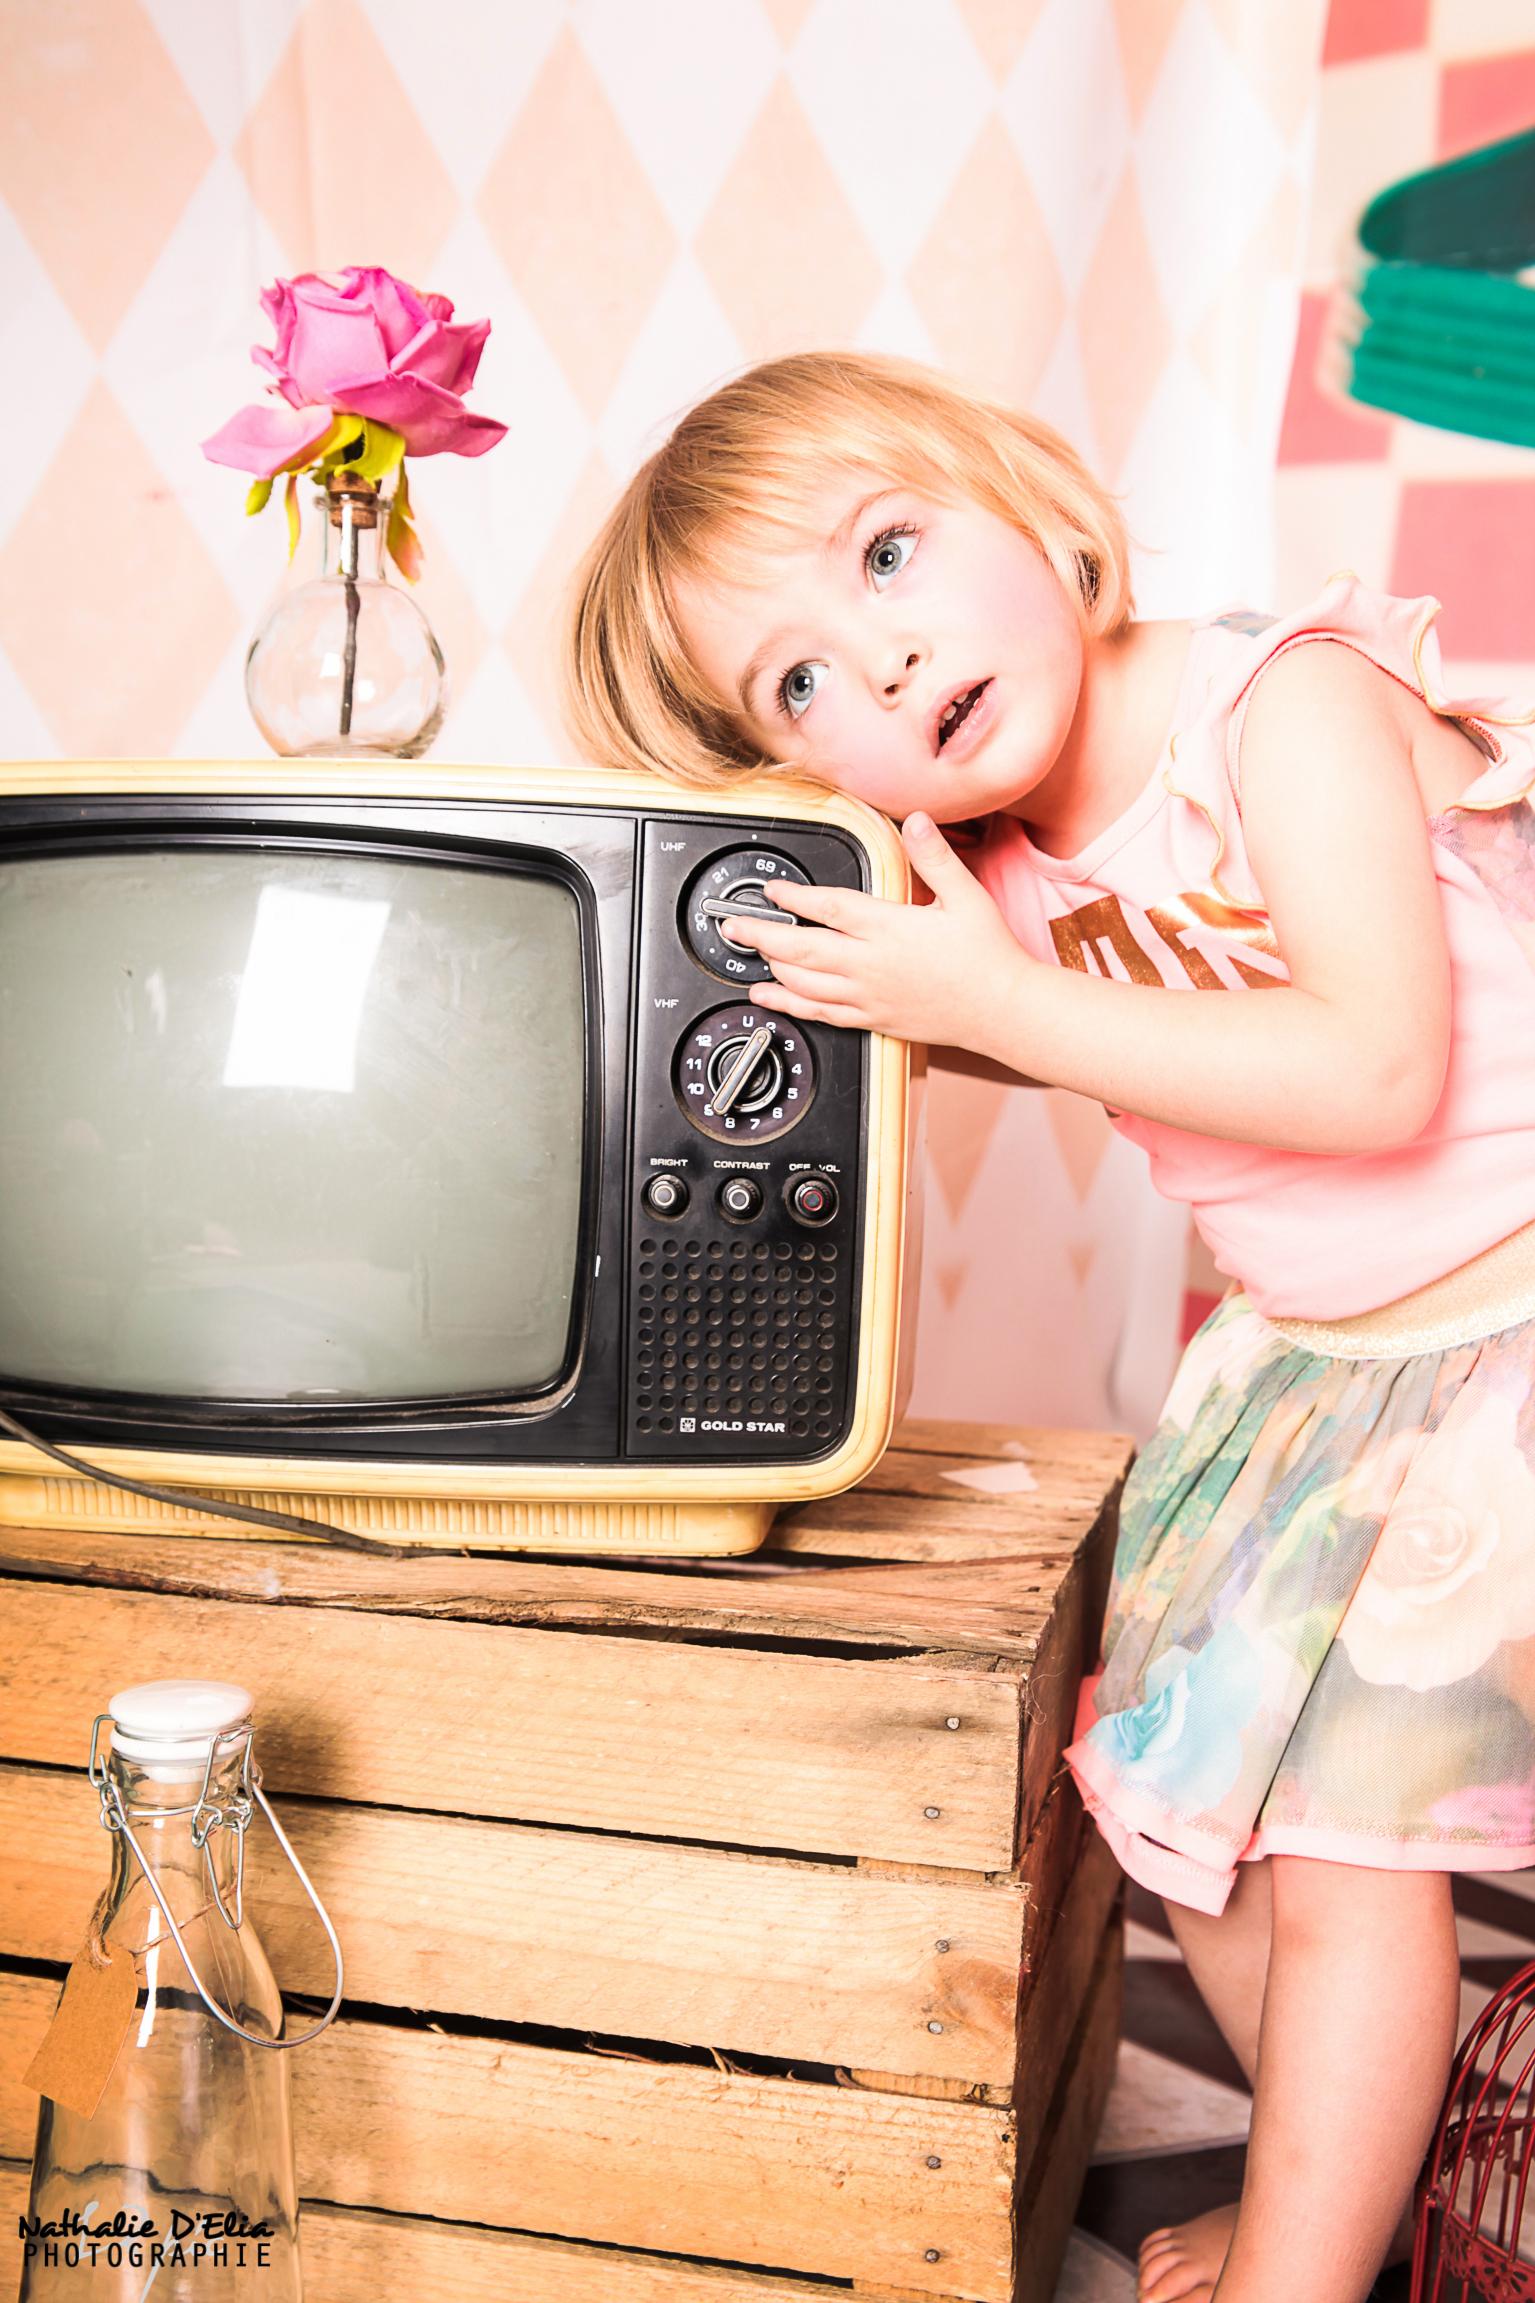 photo enfant nathalie d'elia